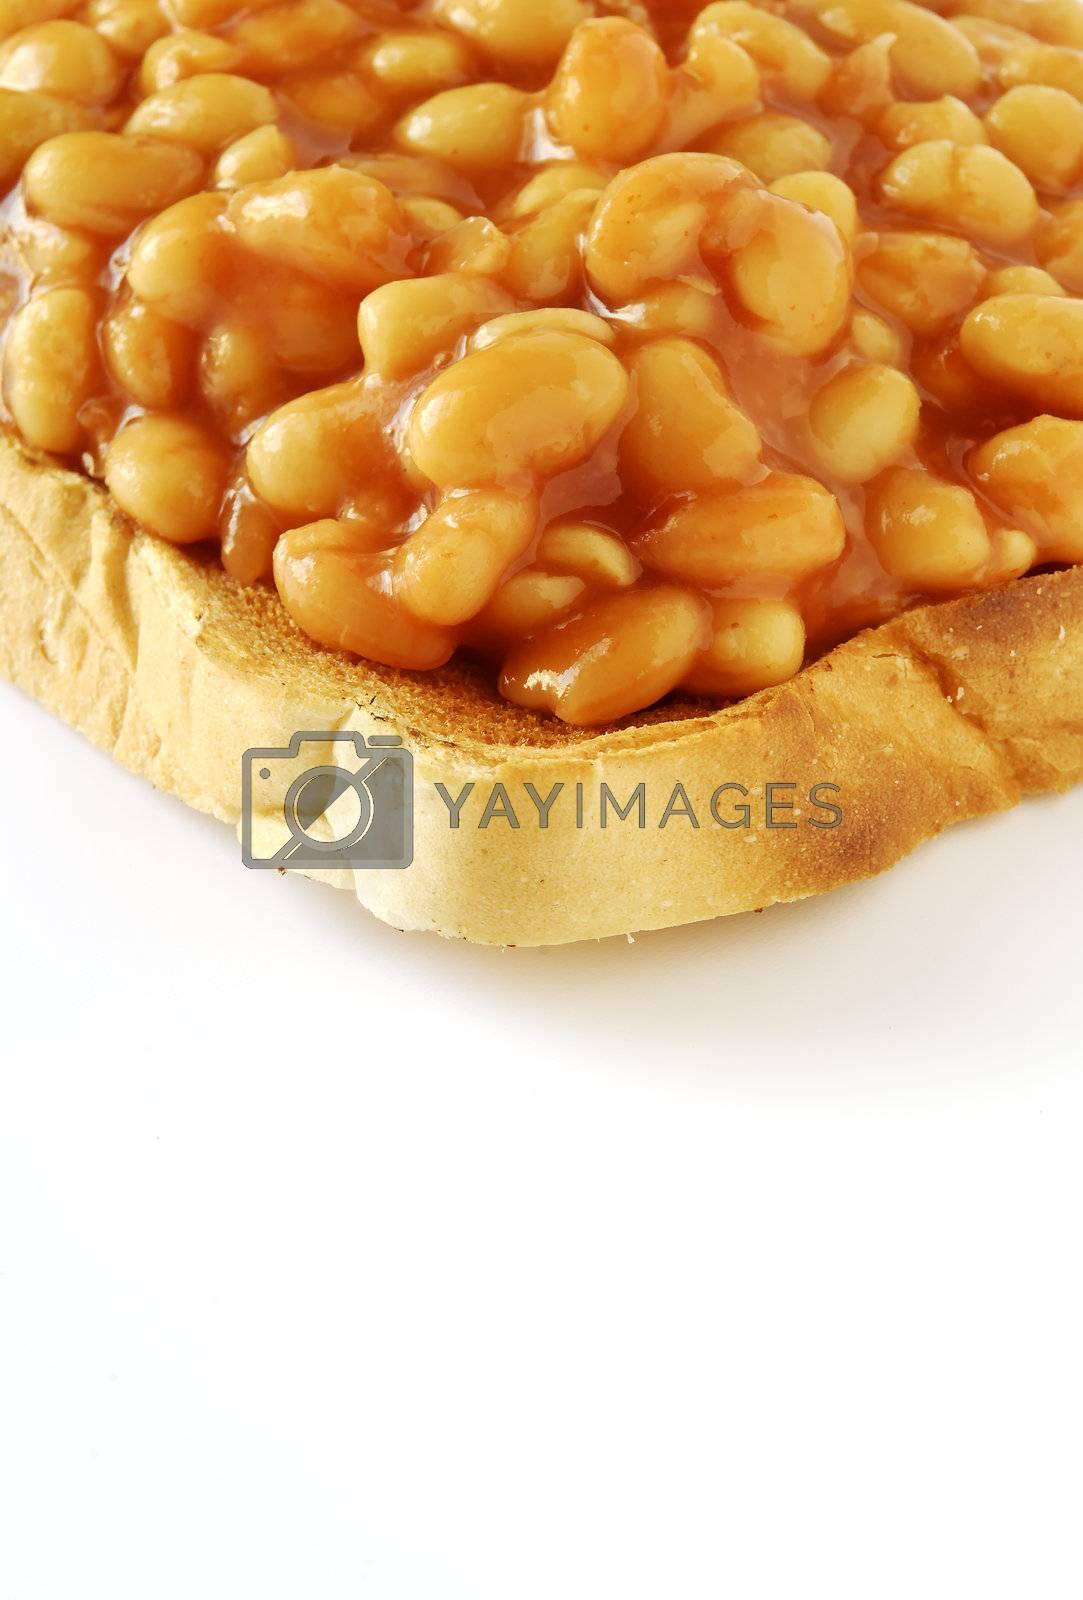 beans on toast 01 by massman